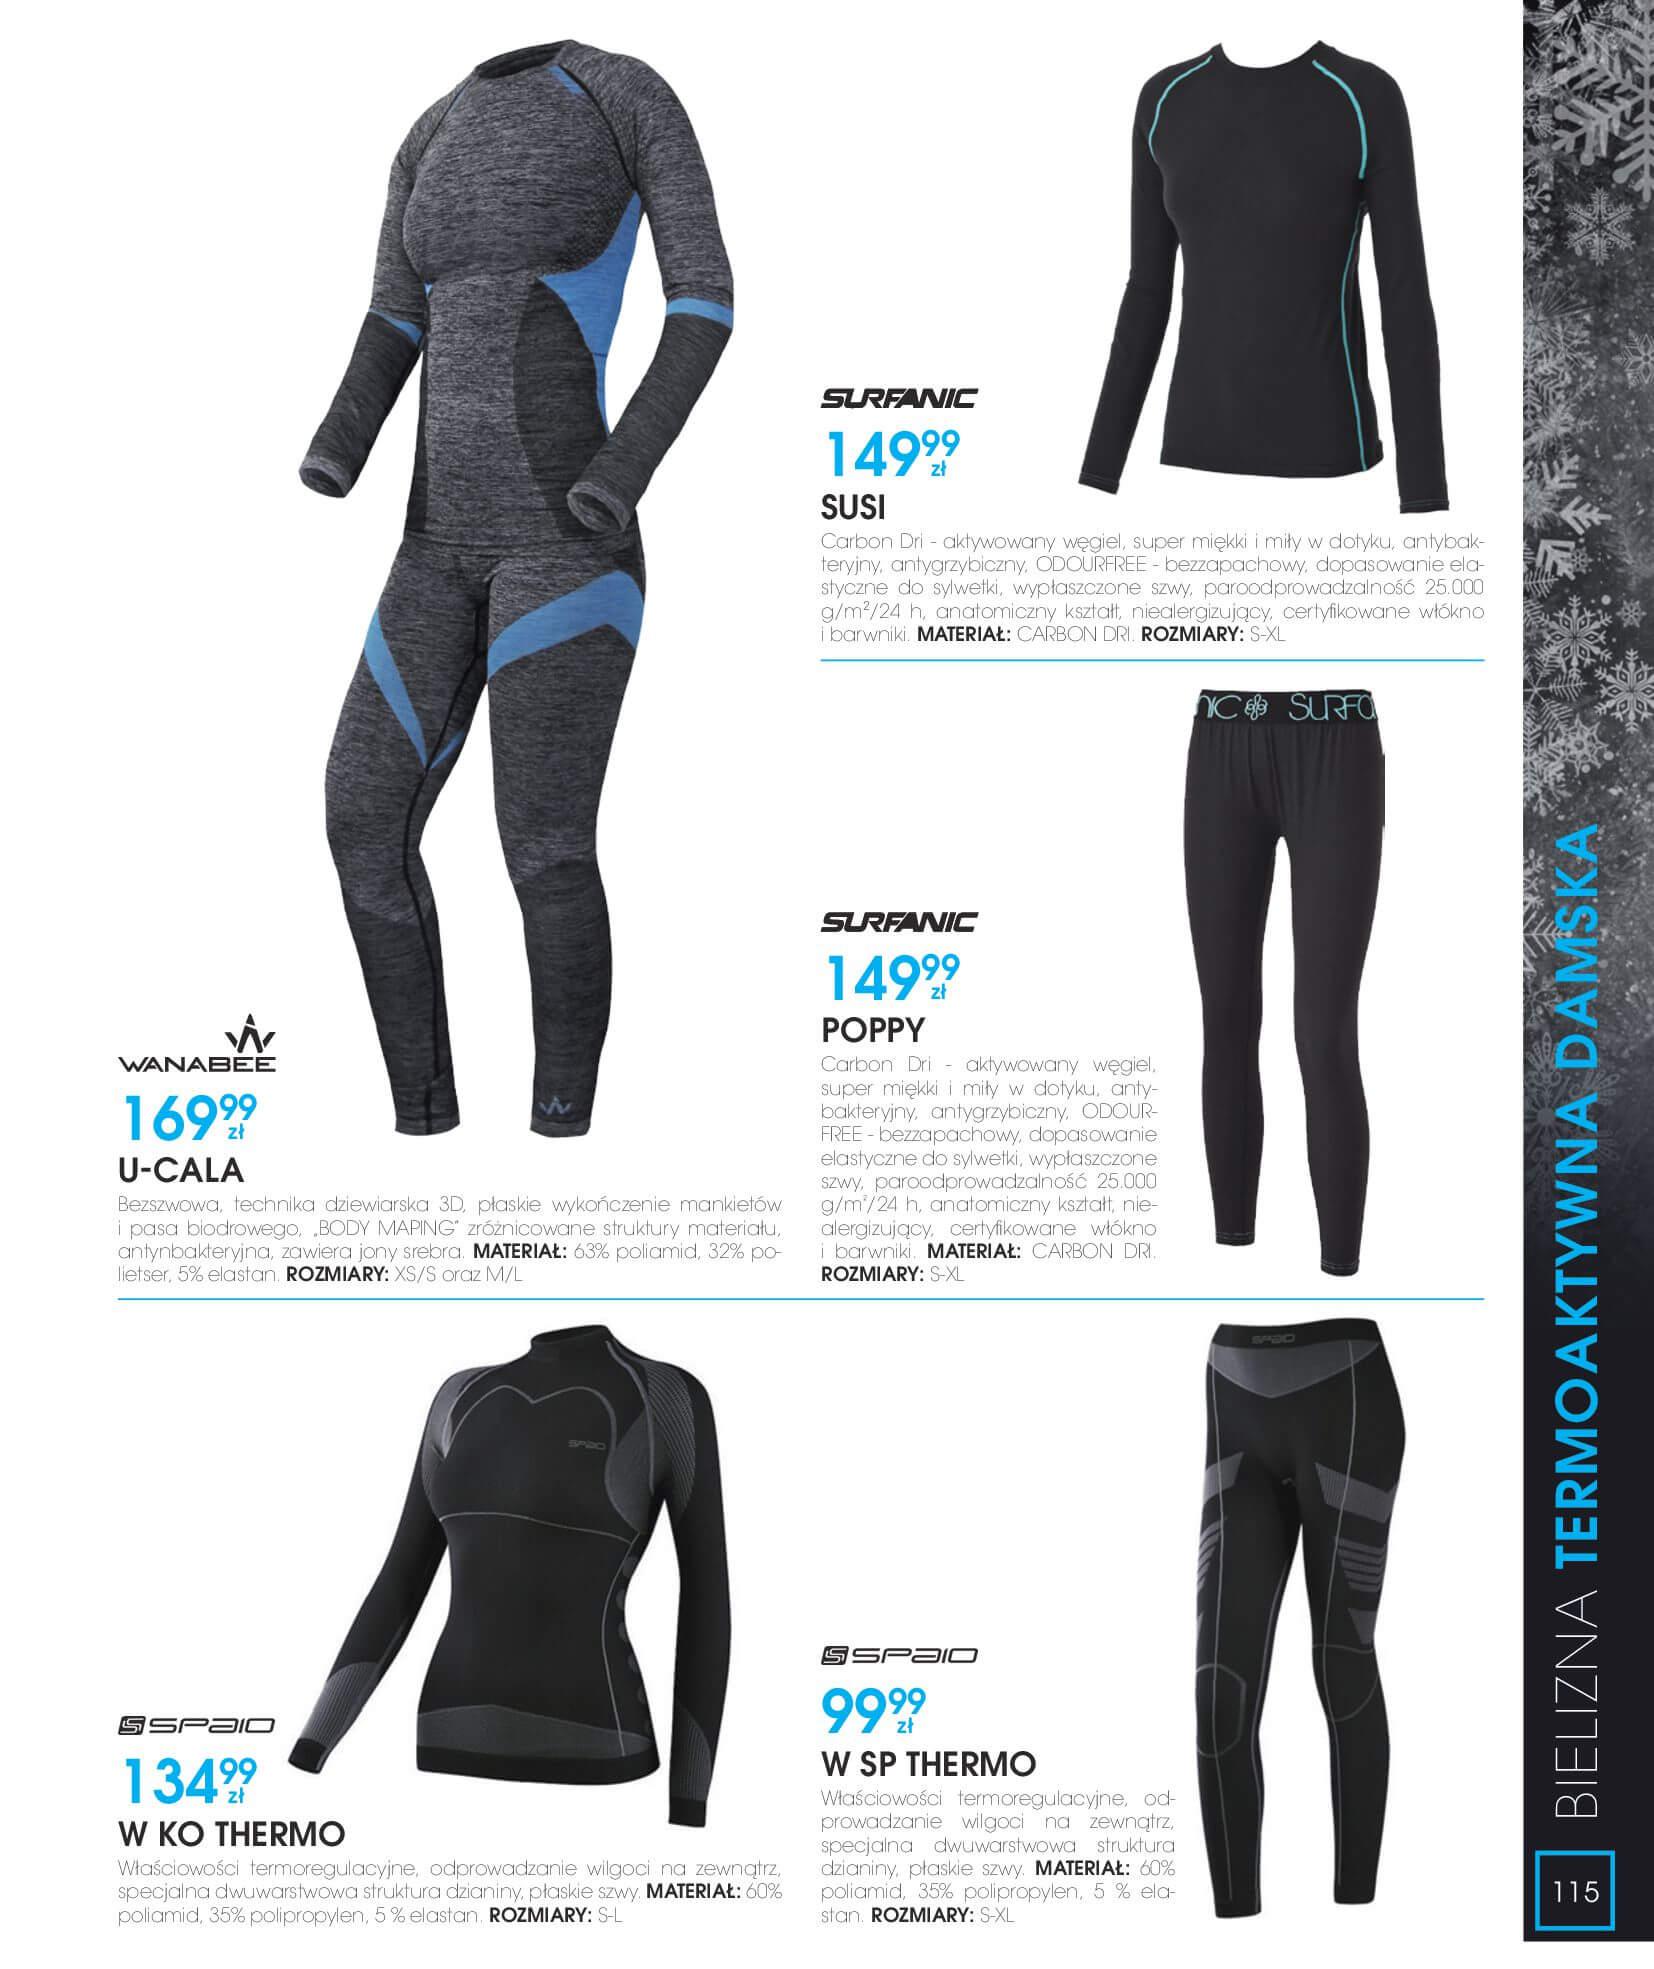 Gazetka Go Sport - Katalog Zima 2017/2018-12.11.2017-28.02.2018-page-115